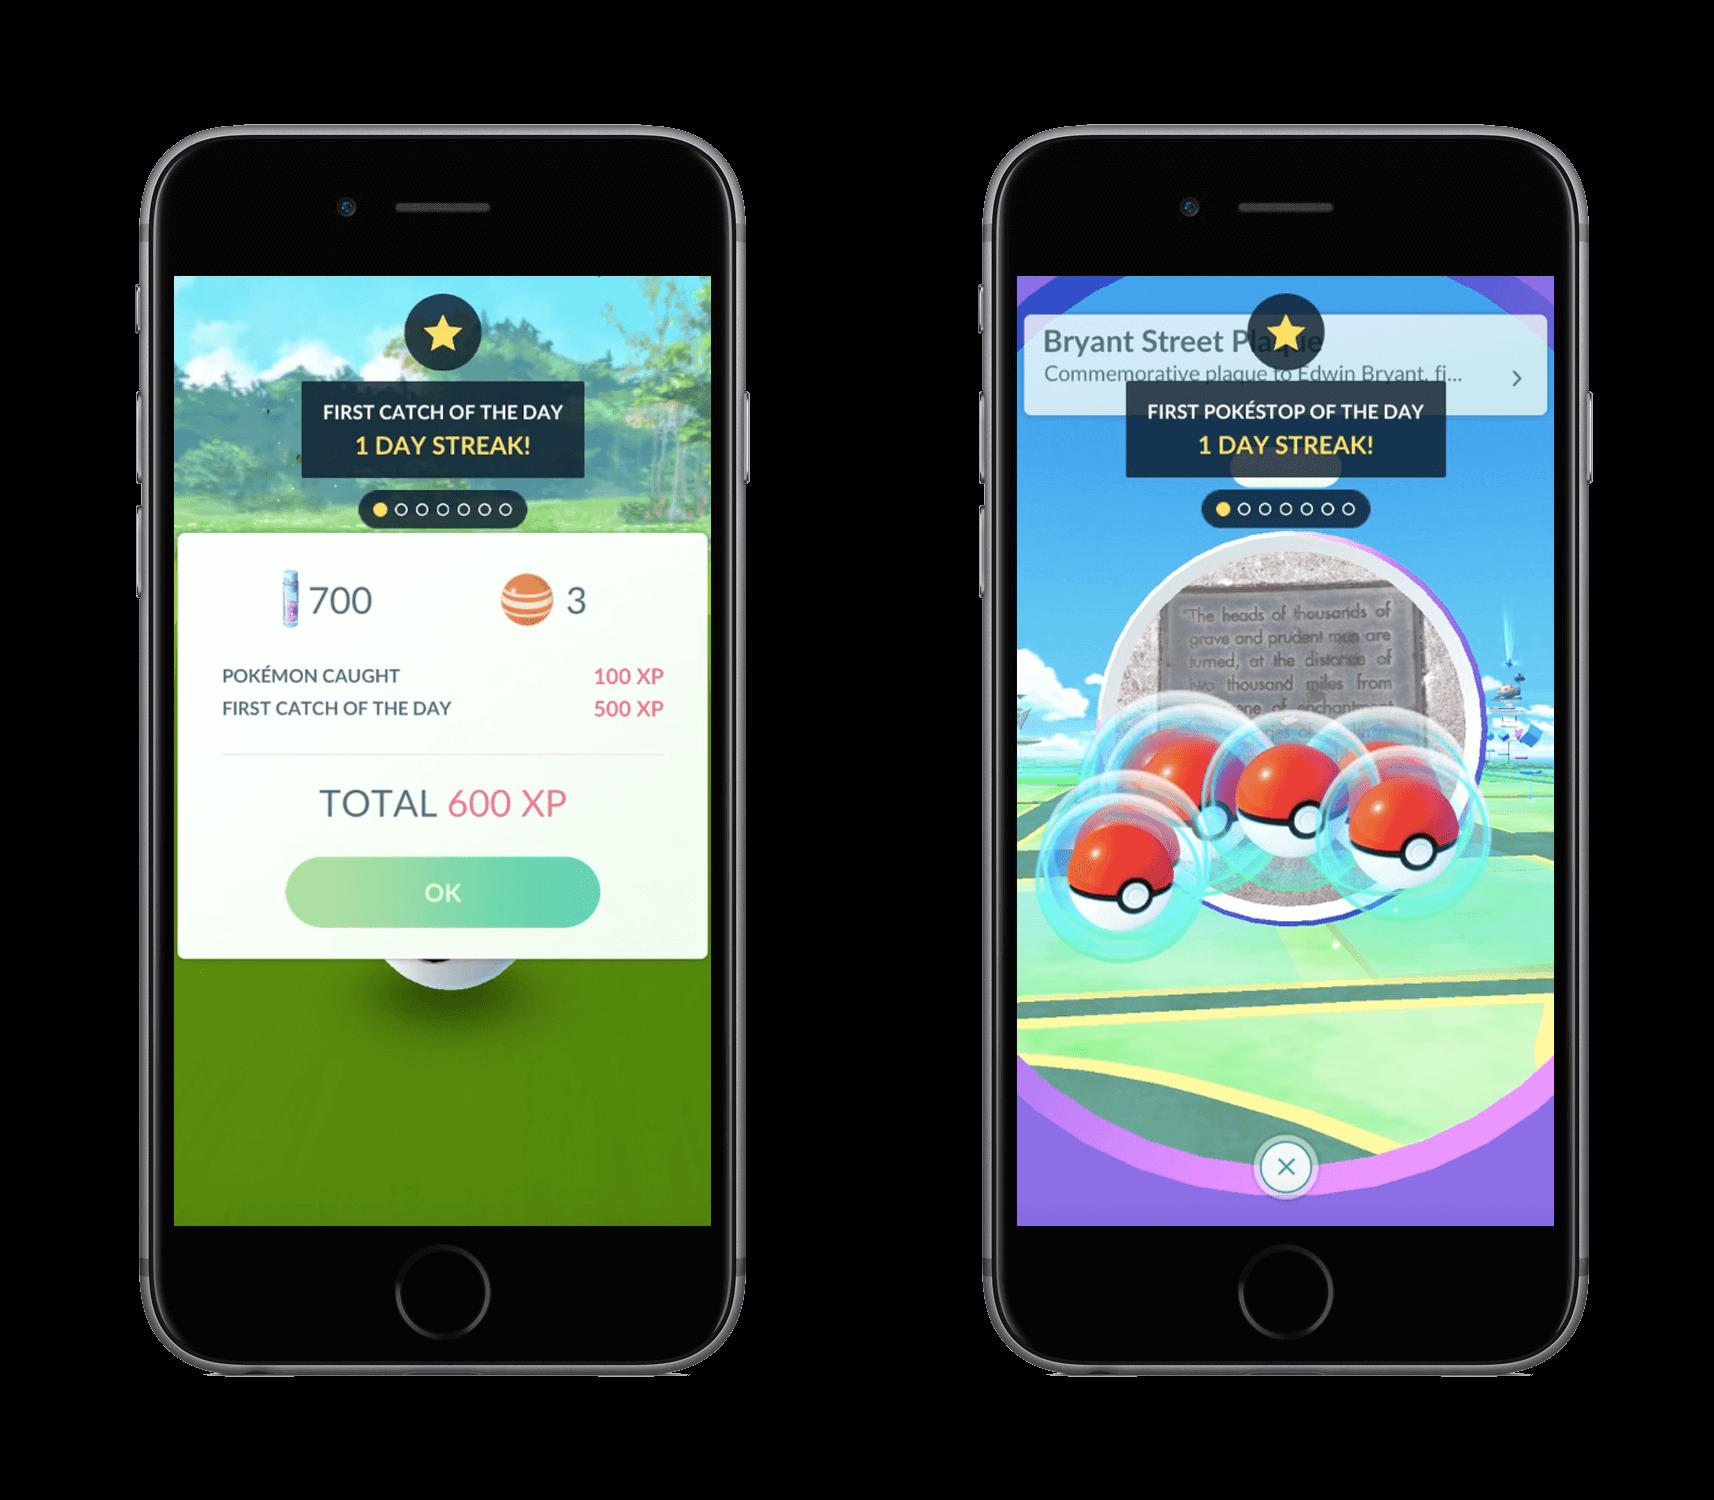 Bonuses are live in Pokémon Go.